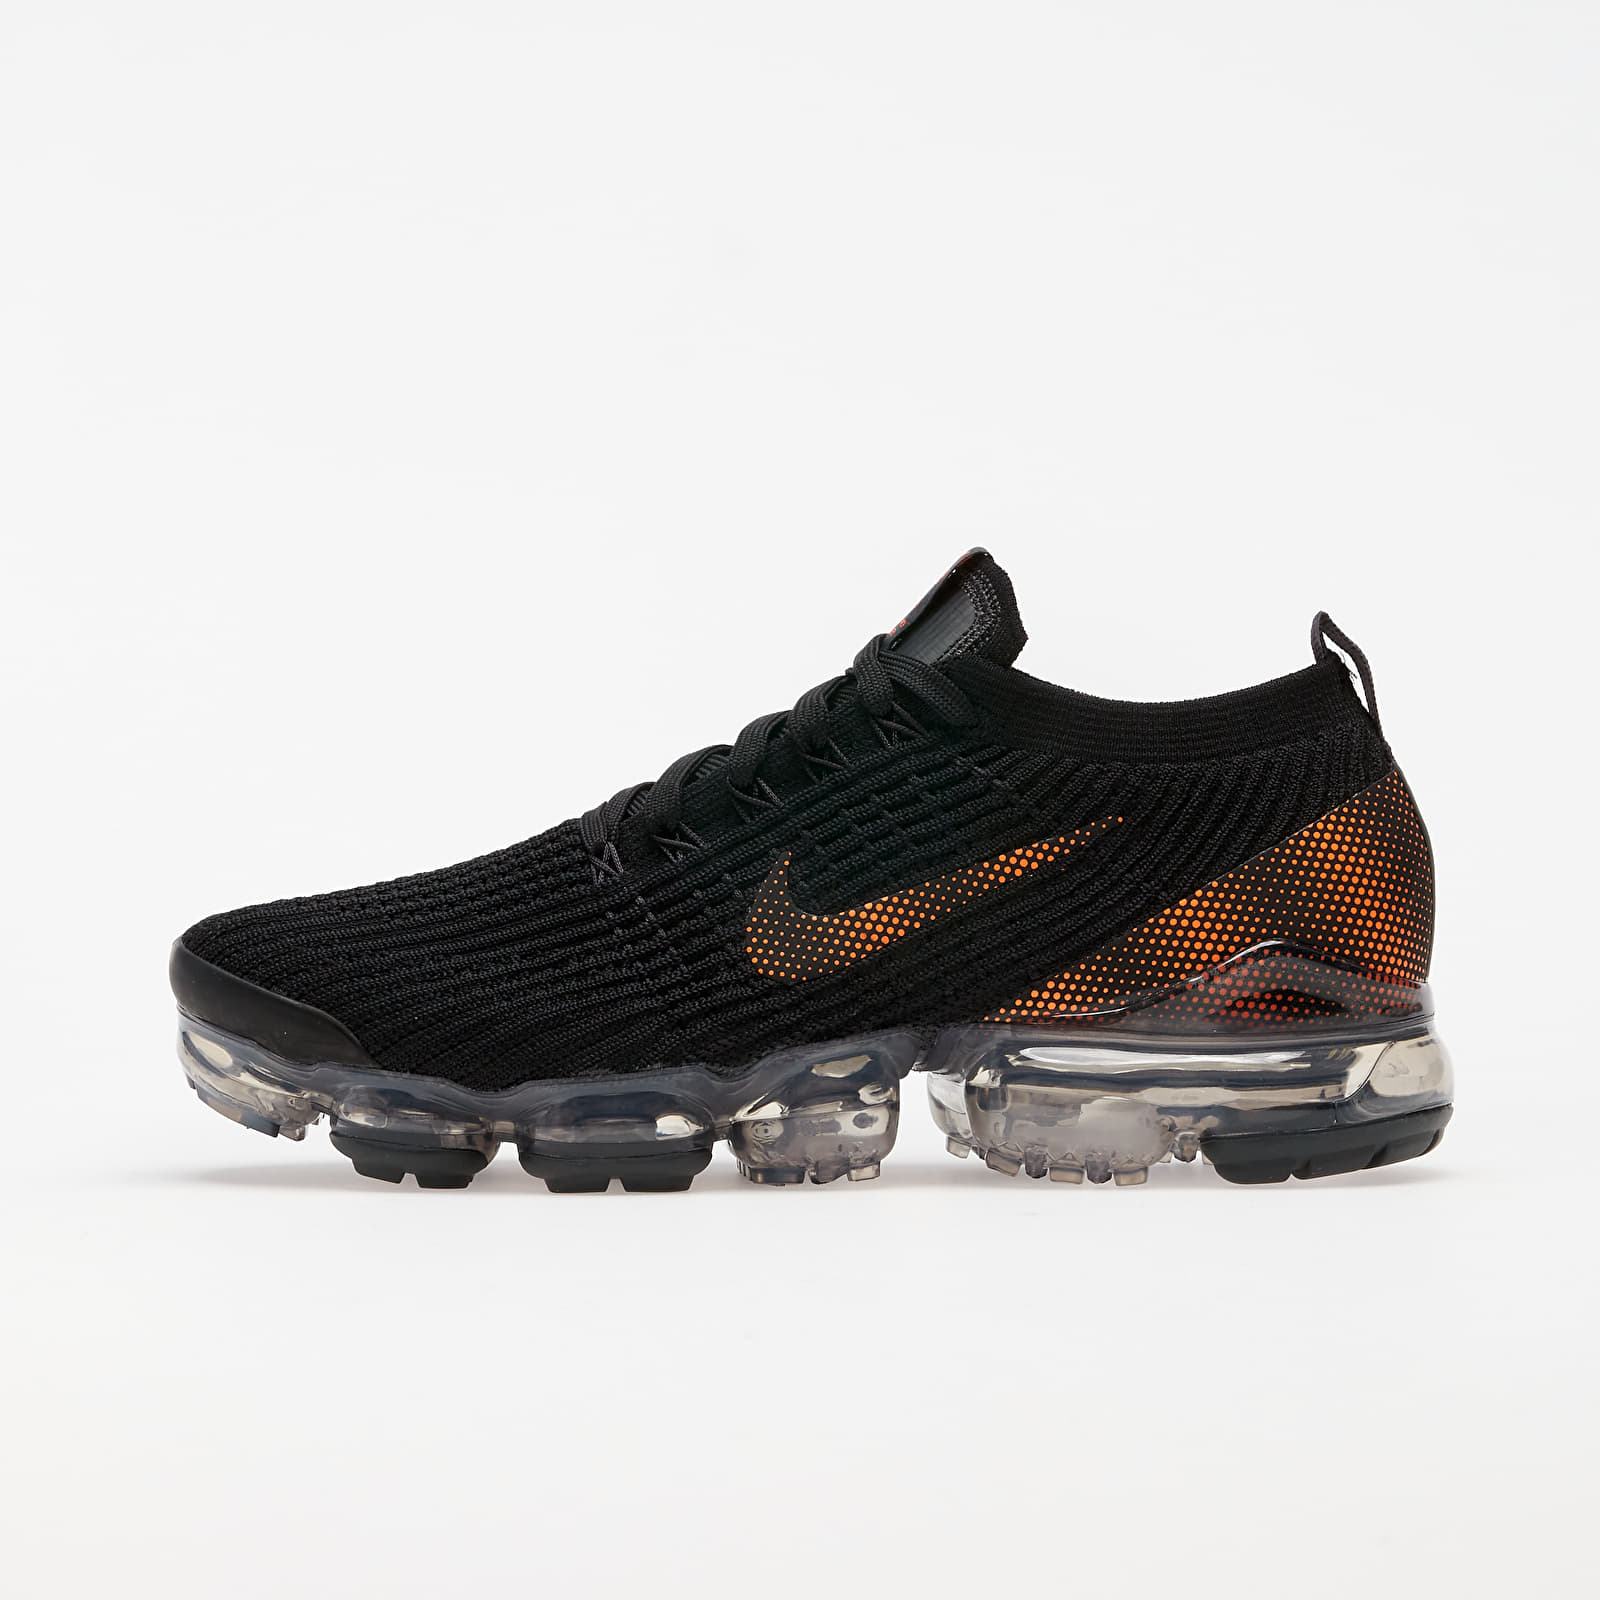 Pánské tenisky a boty Nike Air Vapormax Flyknit 3 Black/ Total Orange-Dk Smoke Grey